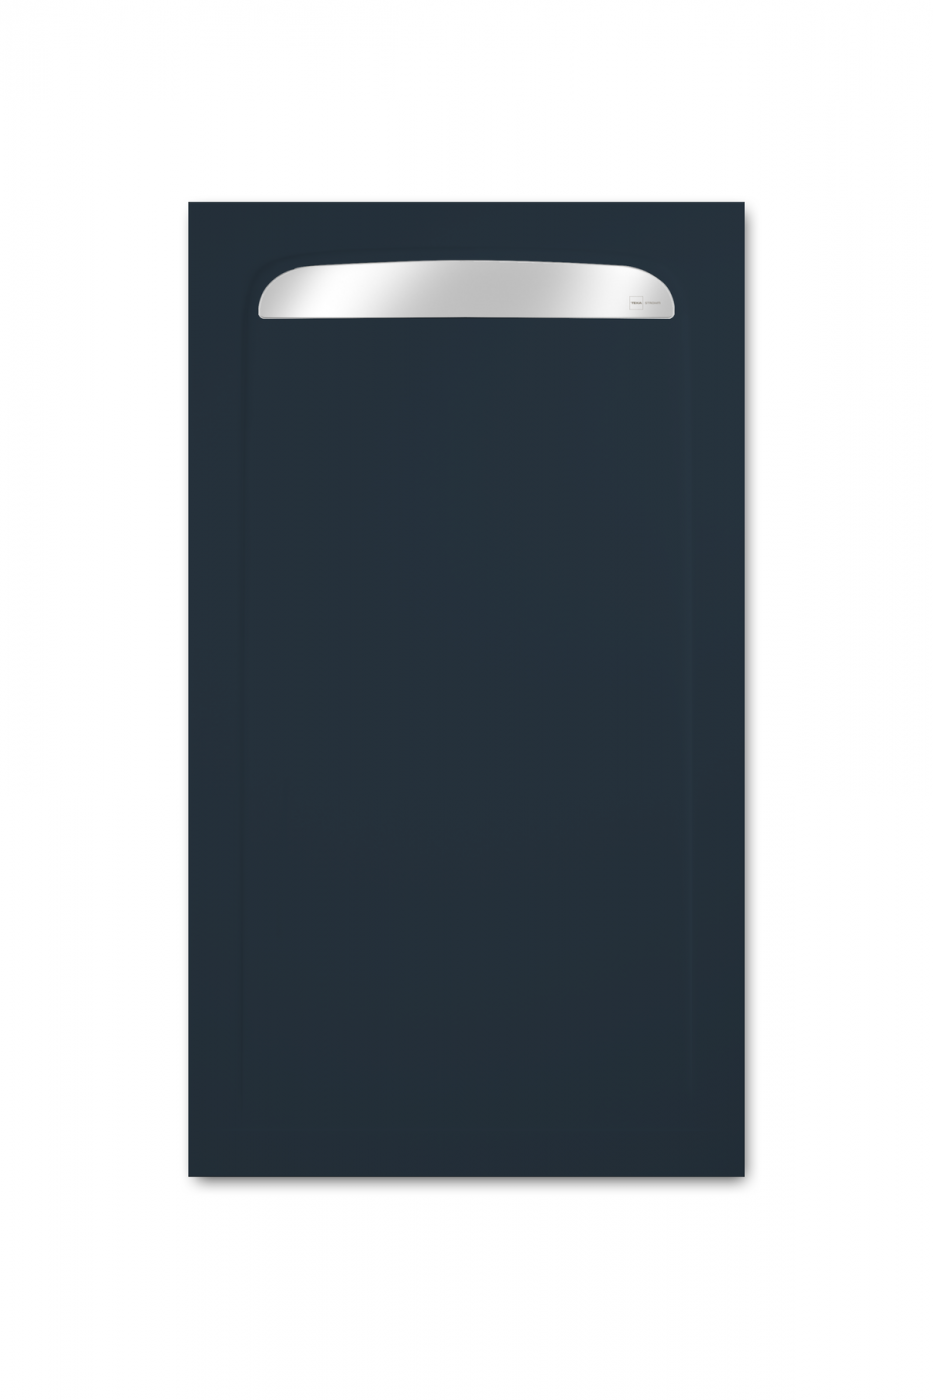 Shower tray XL - 80cm width